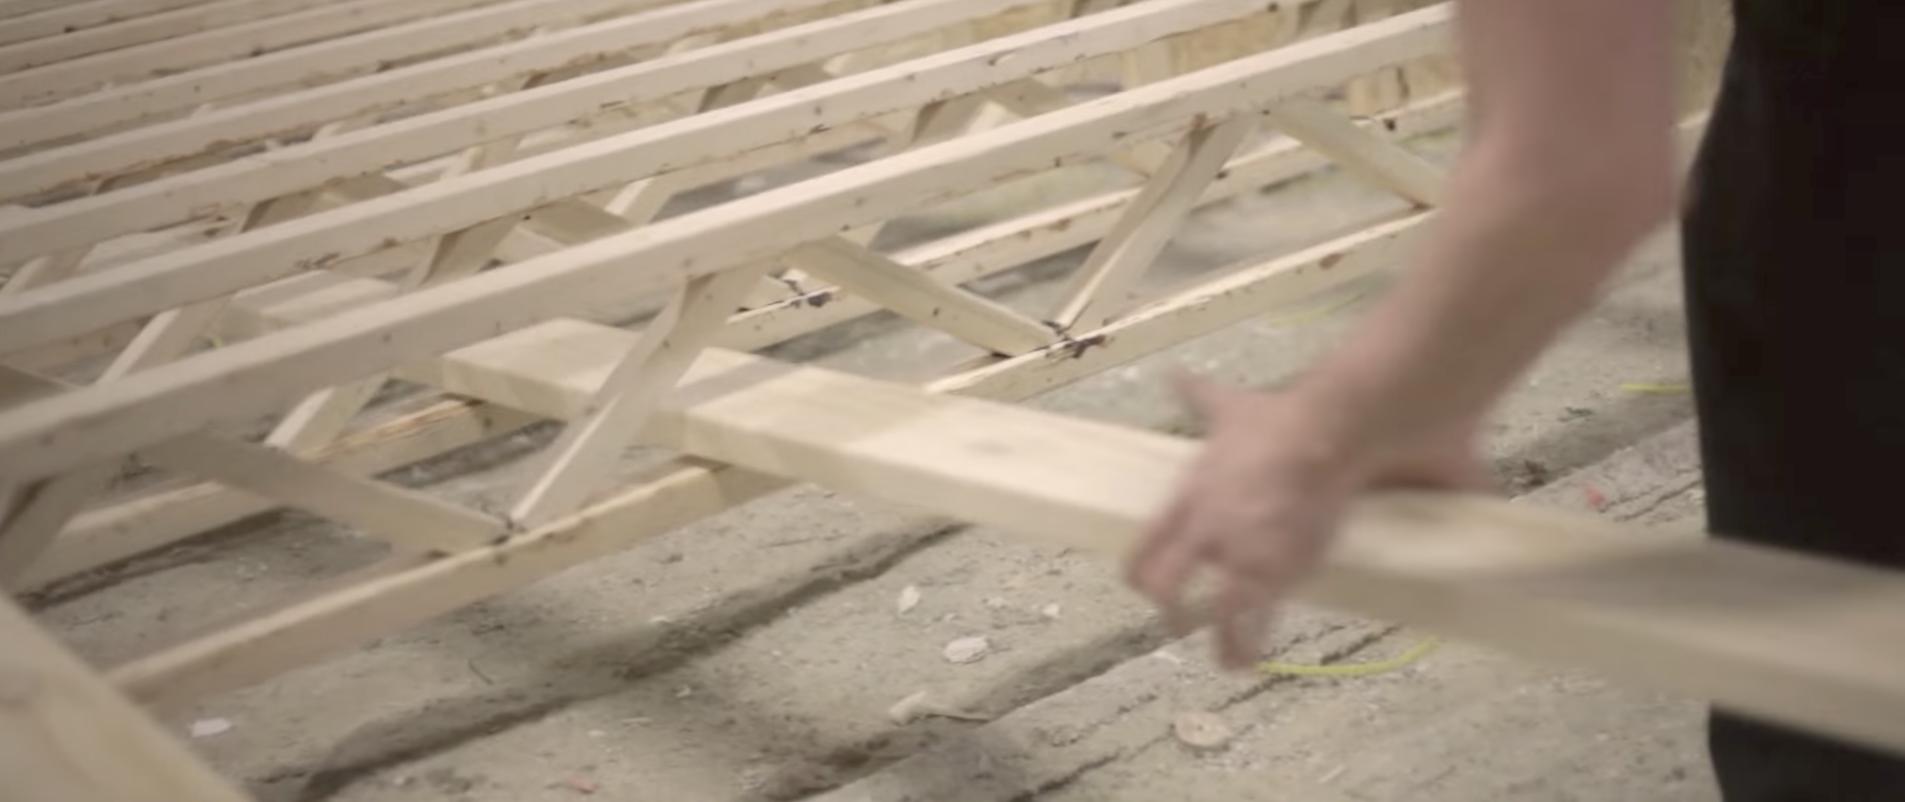 Bonneville modular home floor with strongback